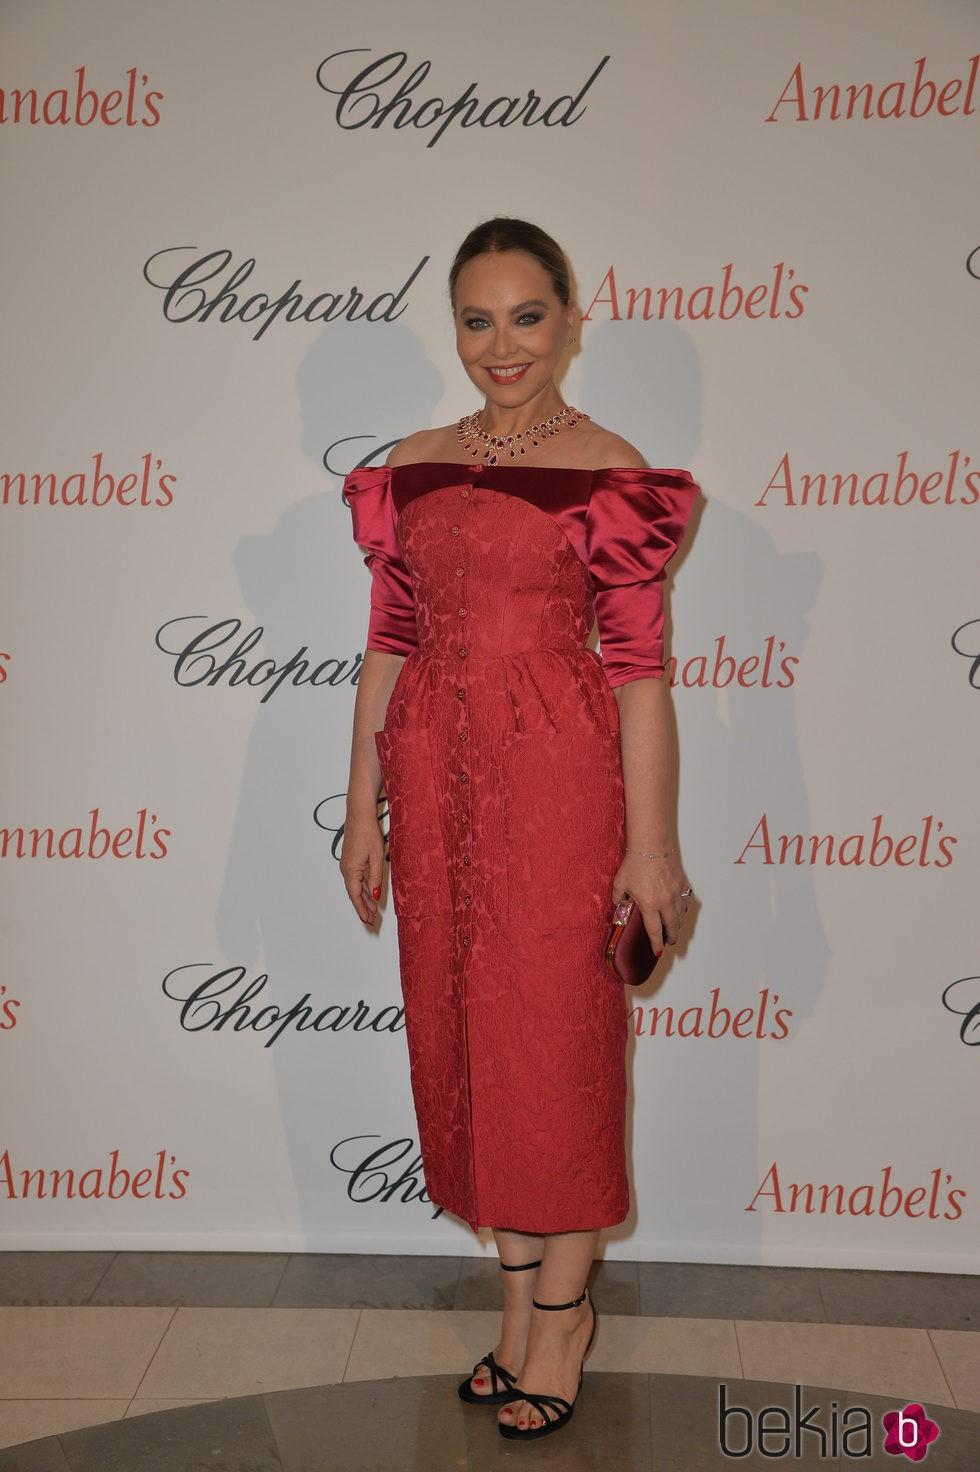 Ornella Muti en la fiesta Chopard Annabel's del Festival de Cannes 2015